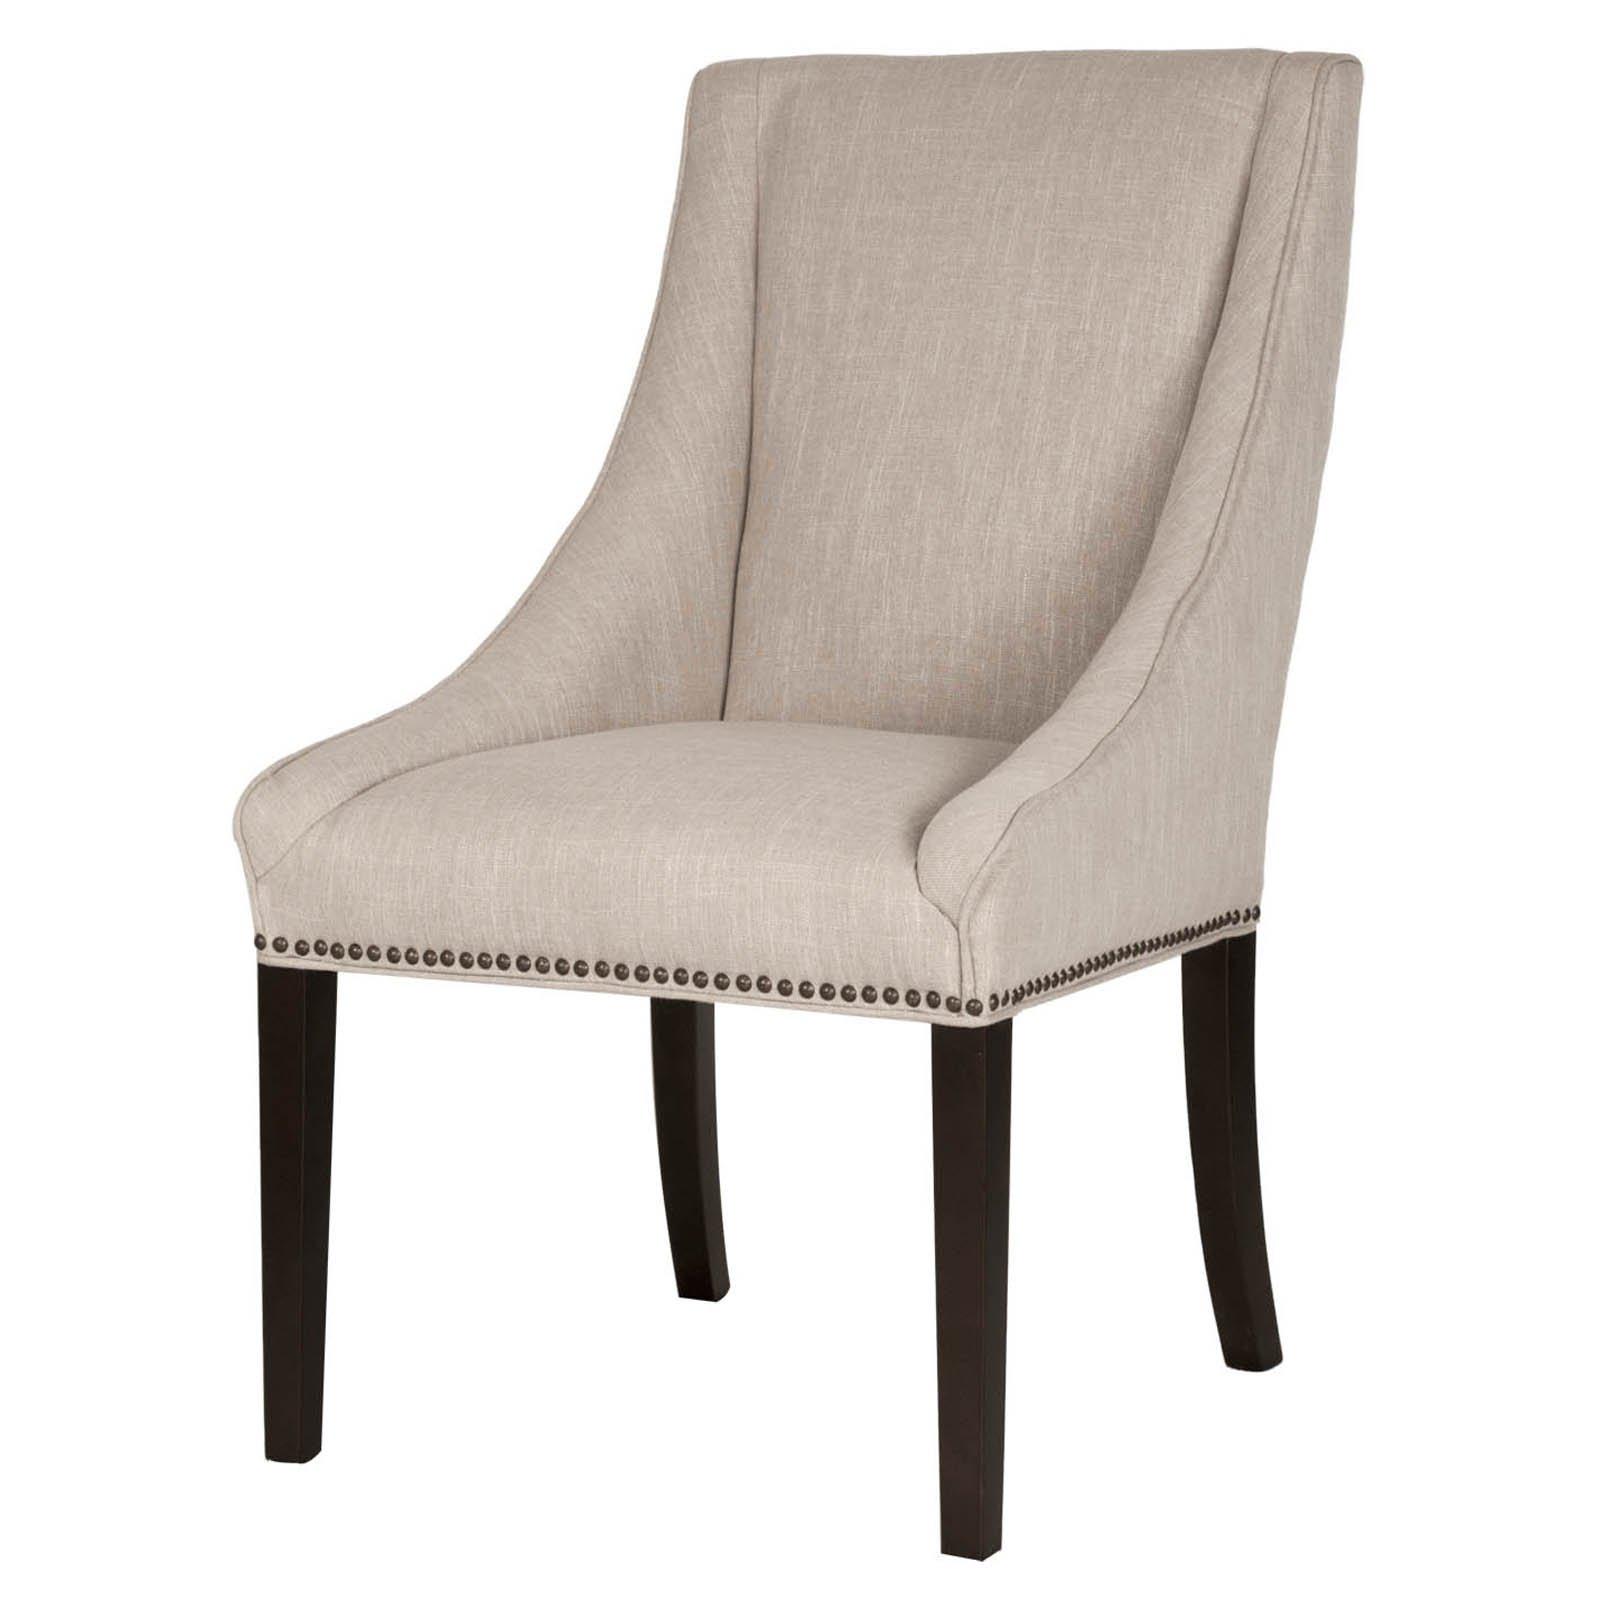 Orient Express Furniture Villa Carson Dining Chair